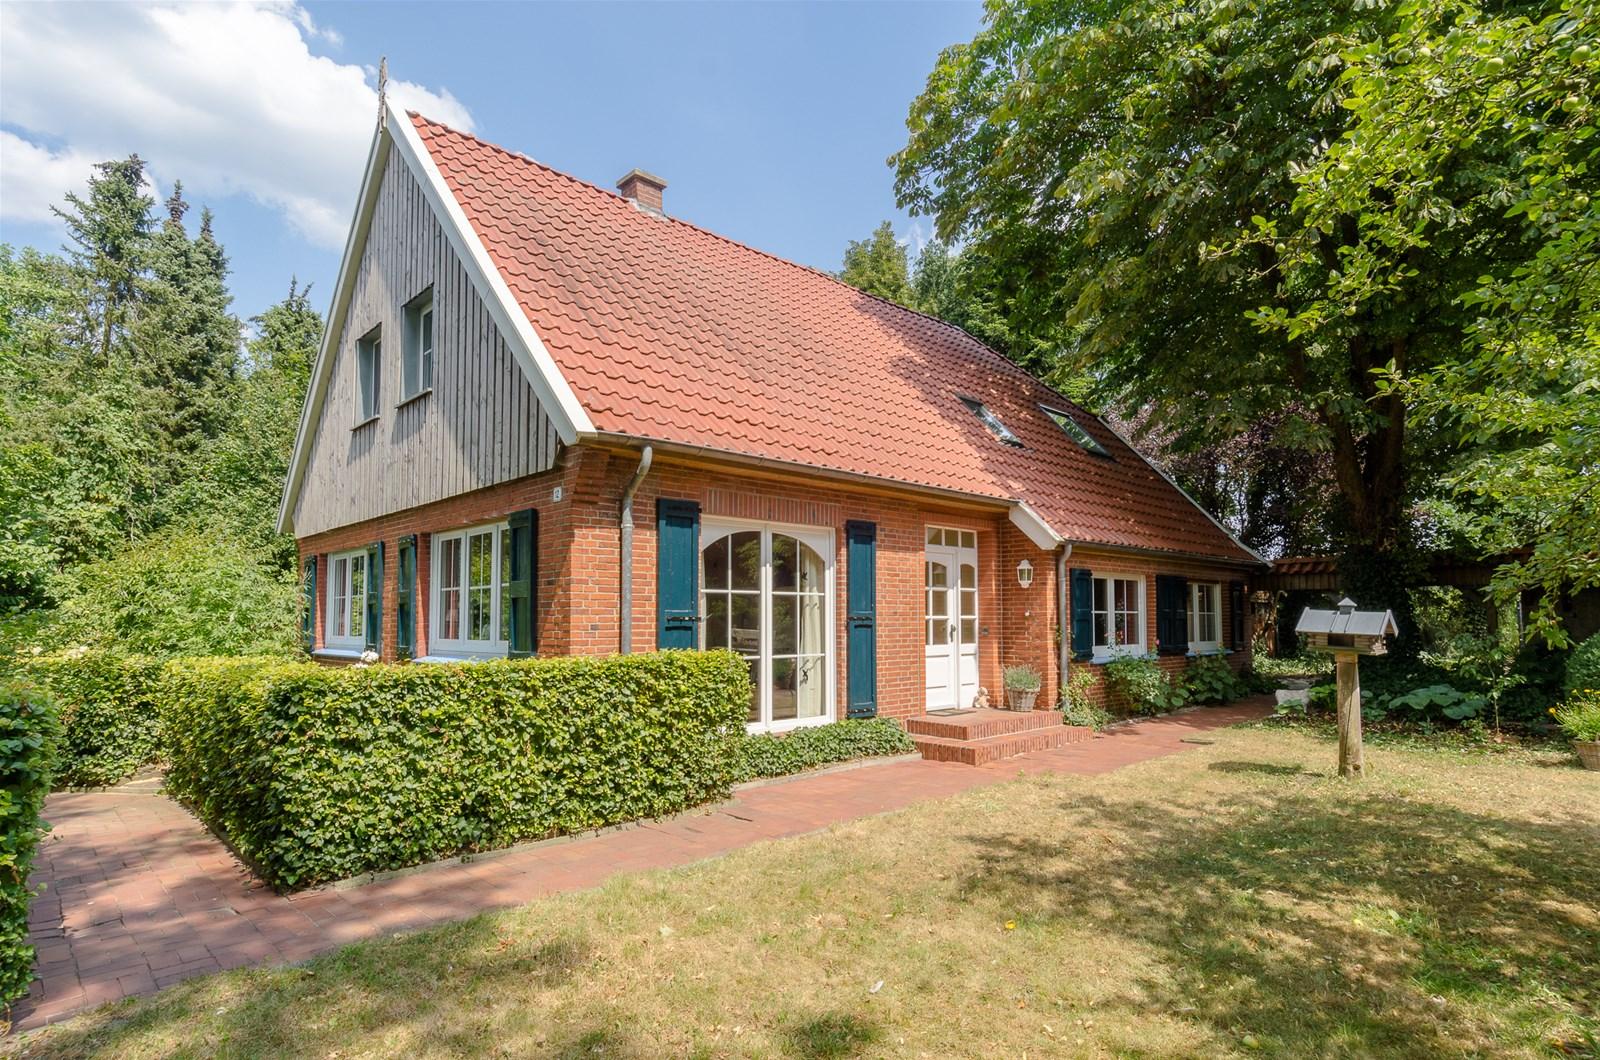 Farmhouse Keuken Landelijk : Hummel haulerwijk specialist in keukens badkamers en tegels